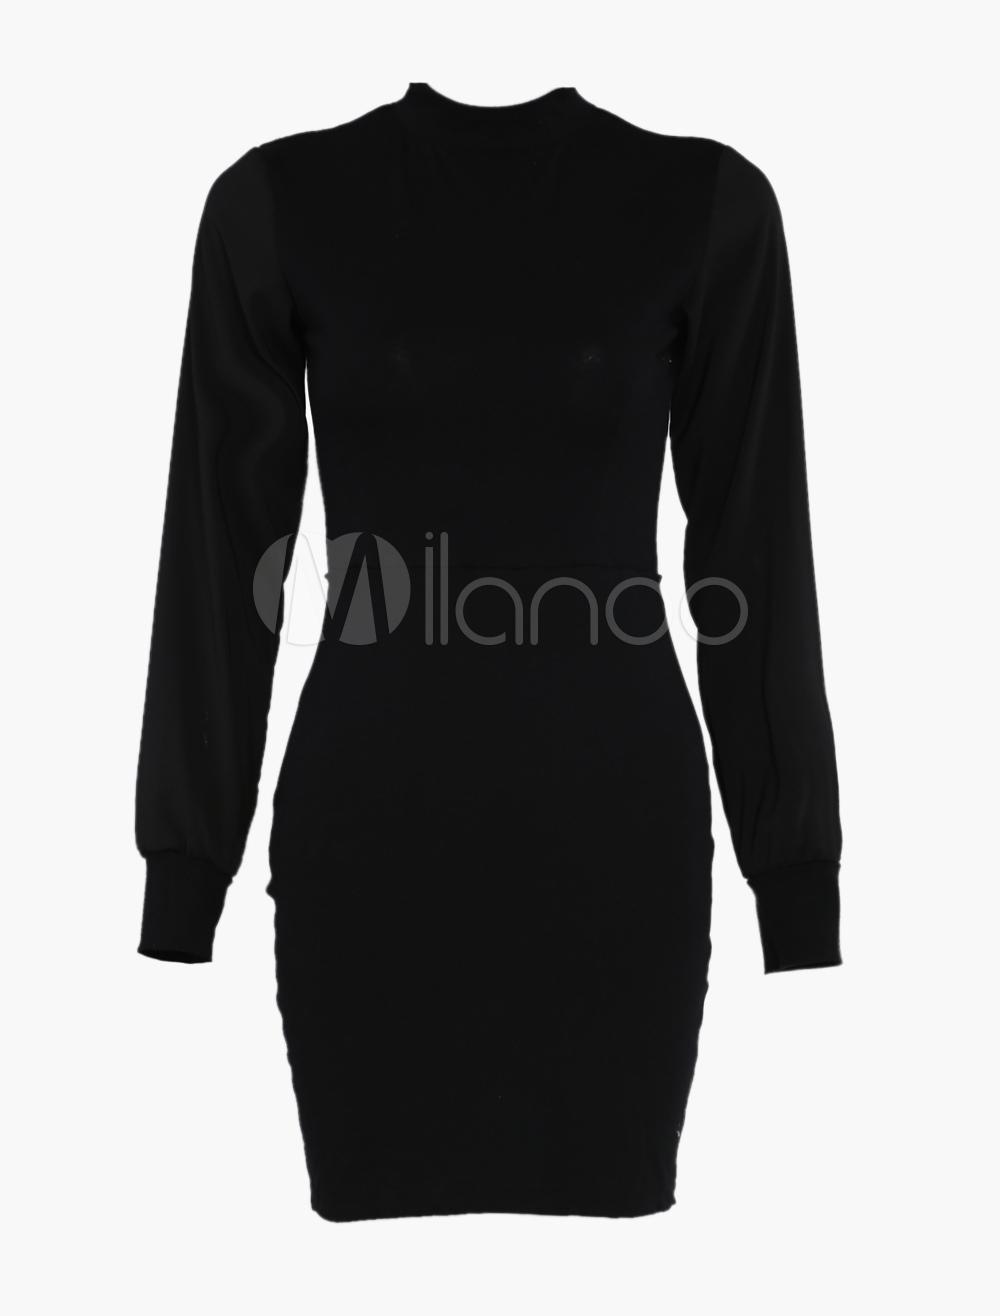 Black High Neck Long Sleeve Backless Dress - Milanoo.com